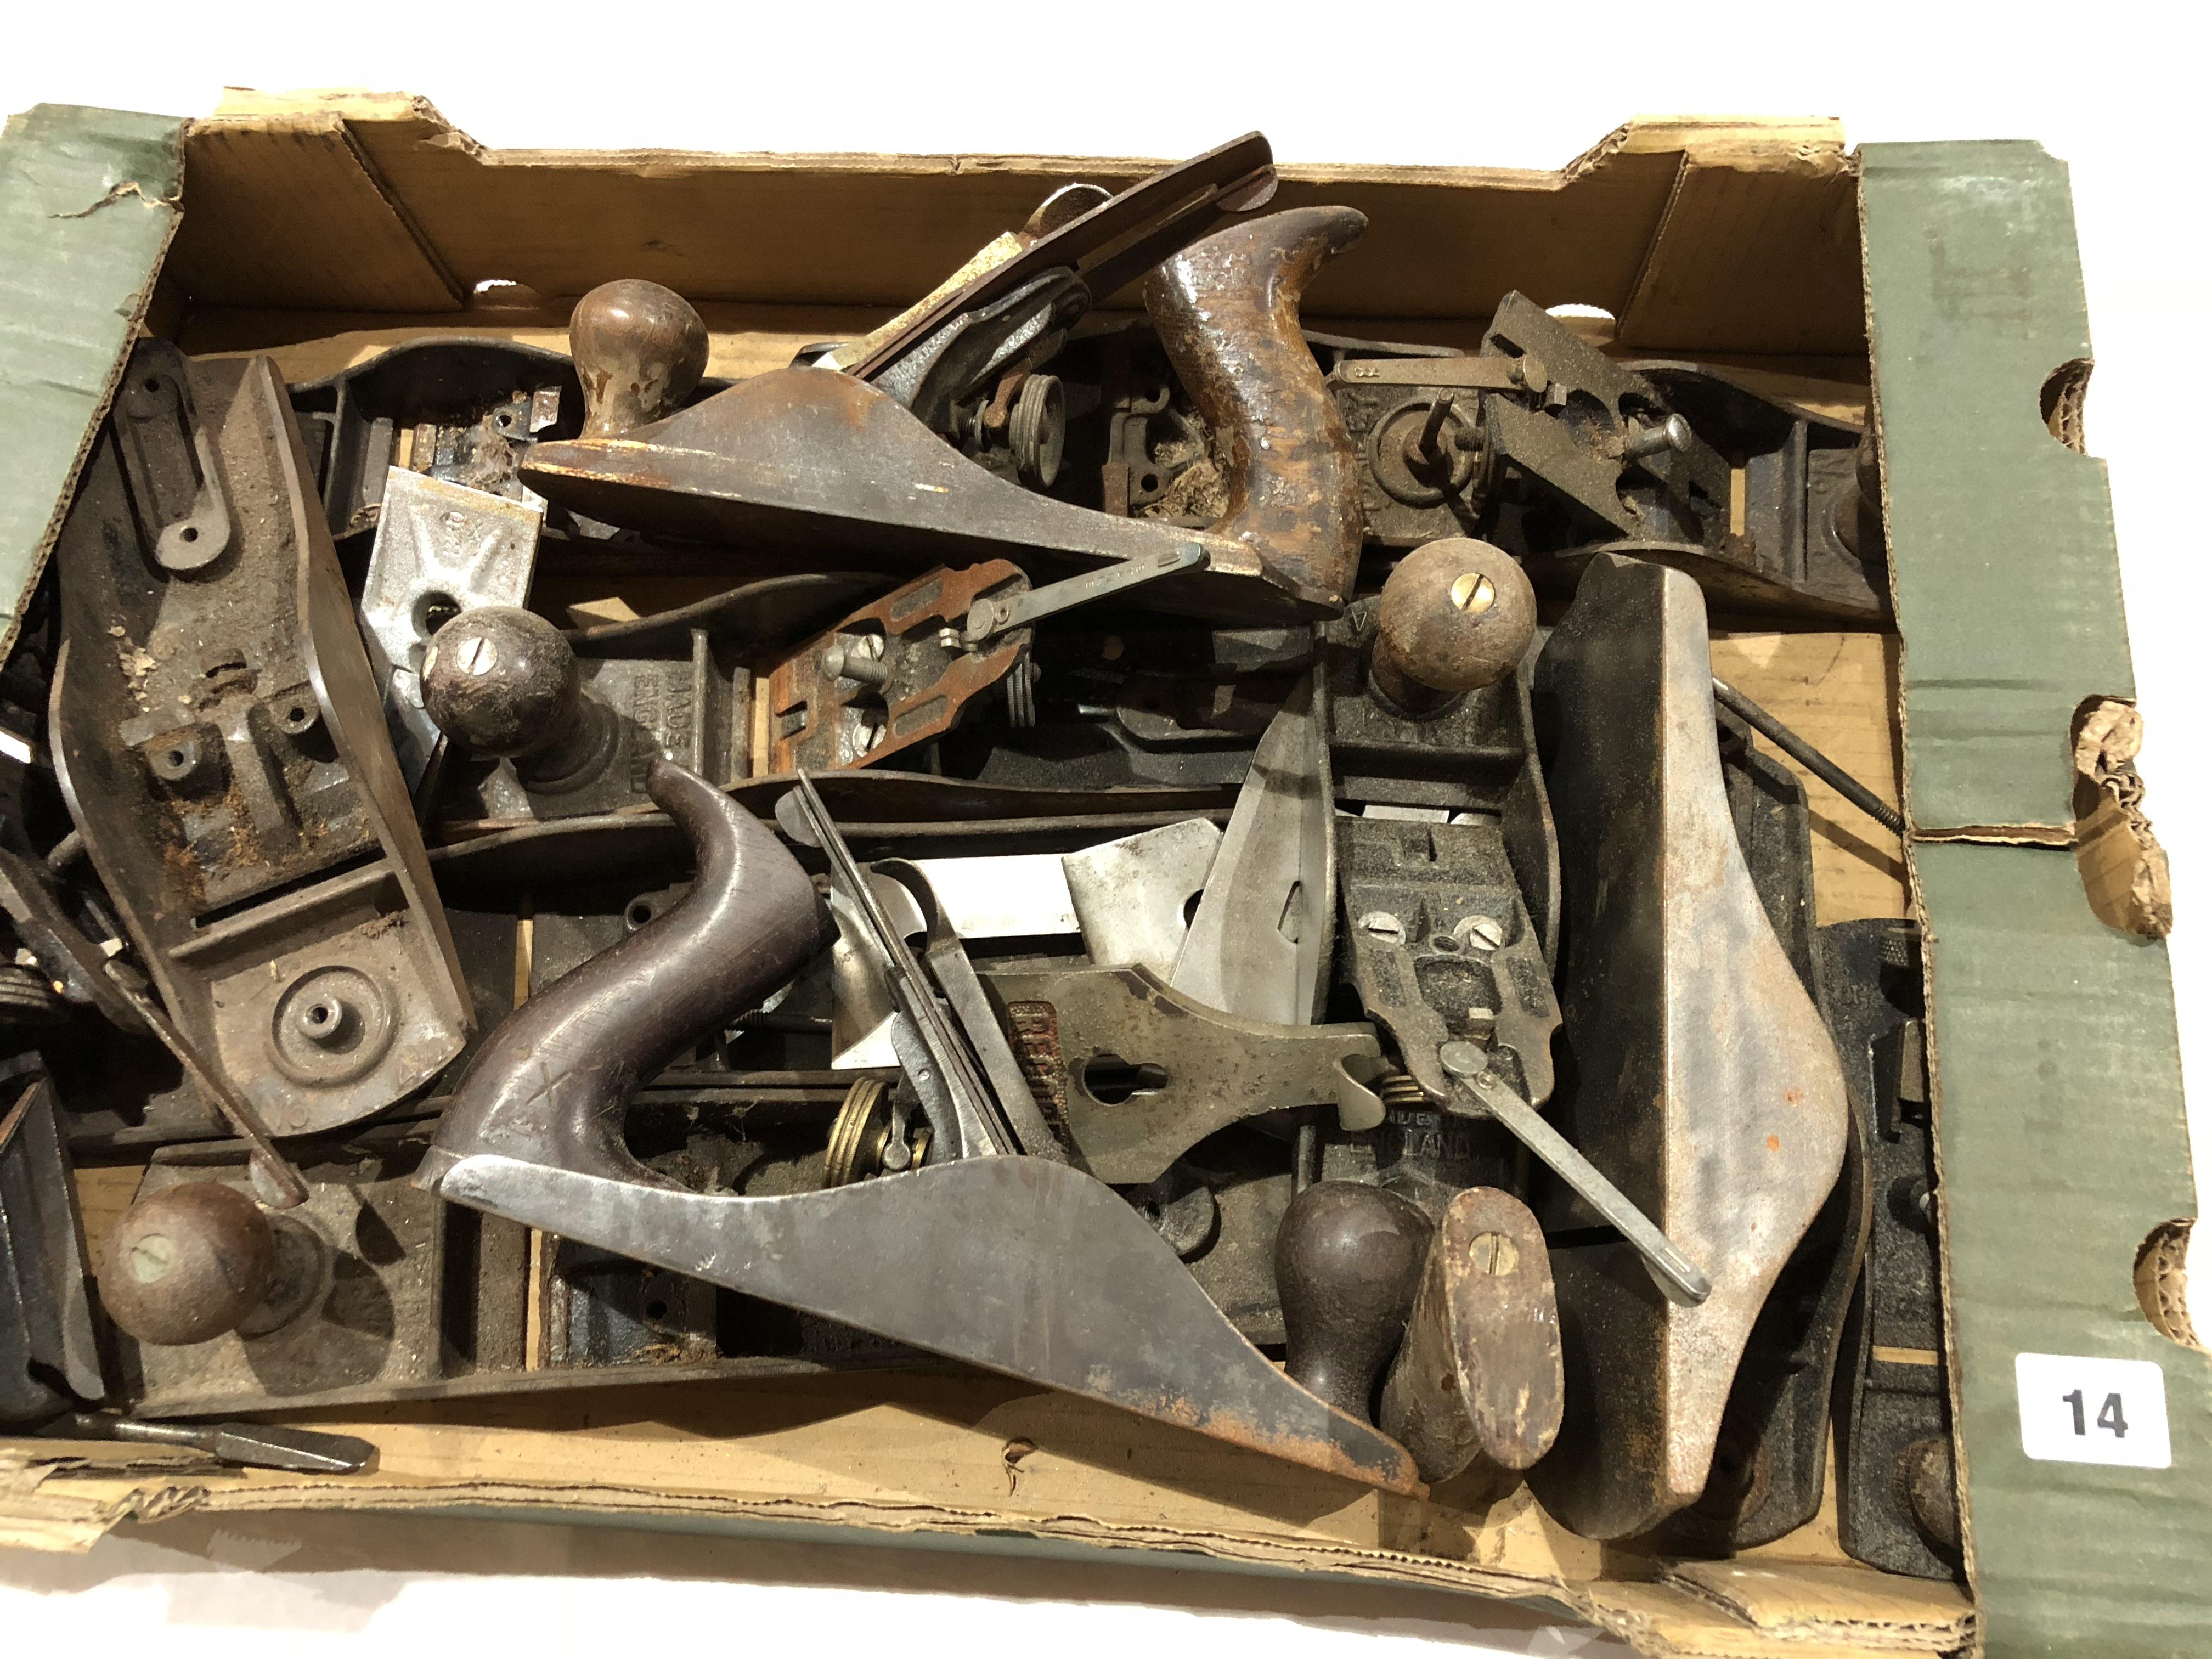 Lot 14 - Metal plane parts for spares or repairs P